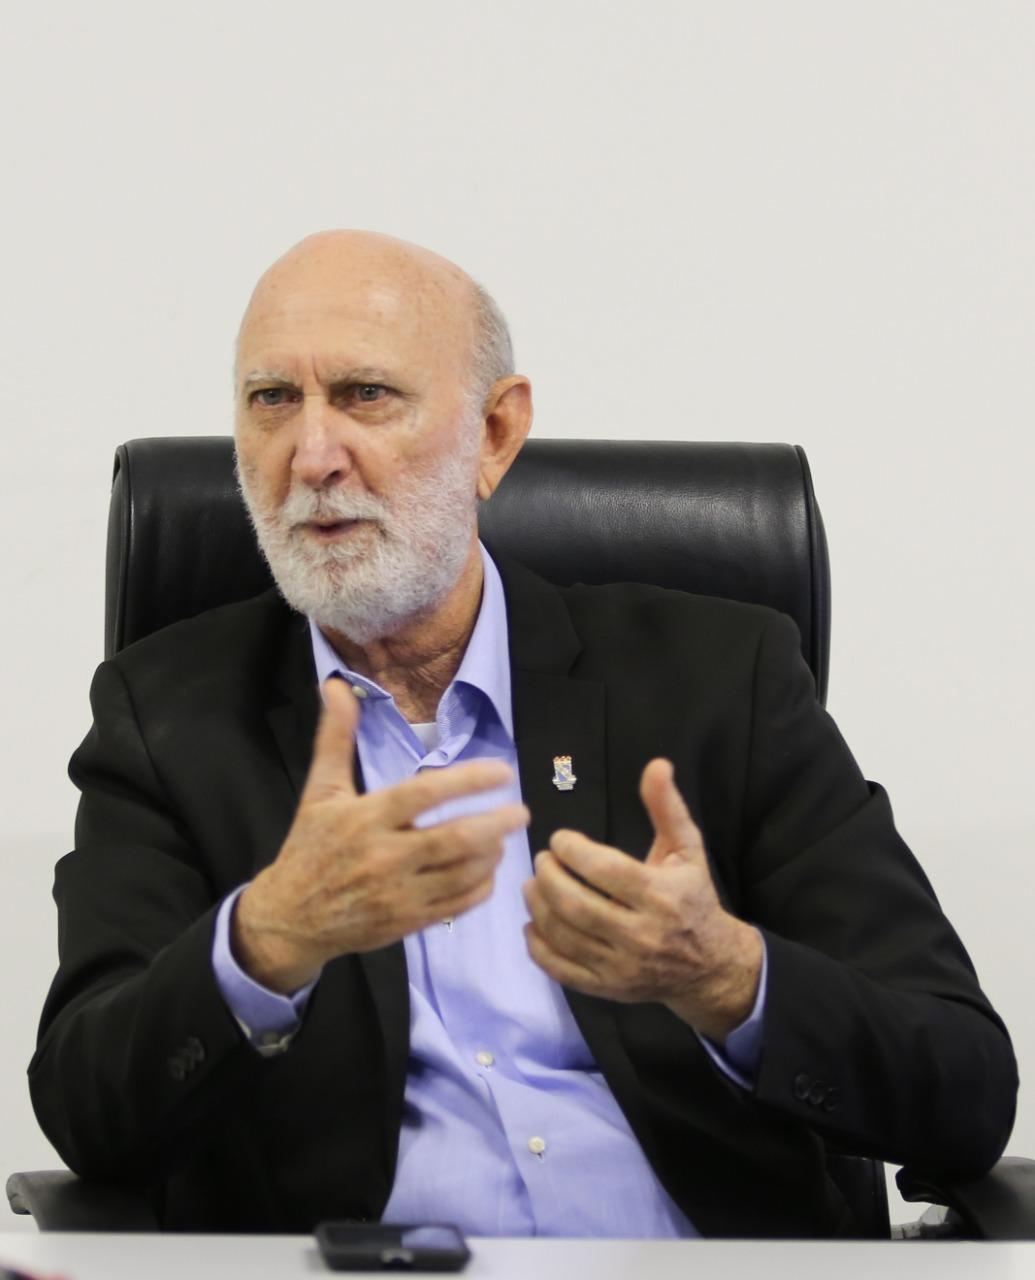 Pró-reitor da UFPB prega defesa da democracia